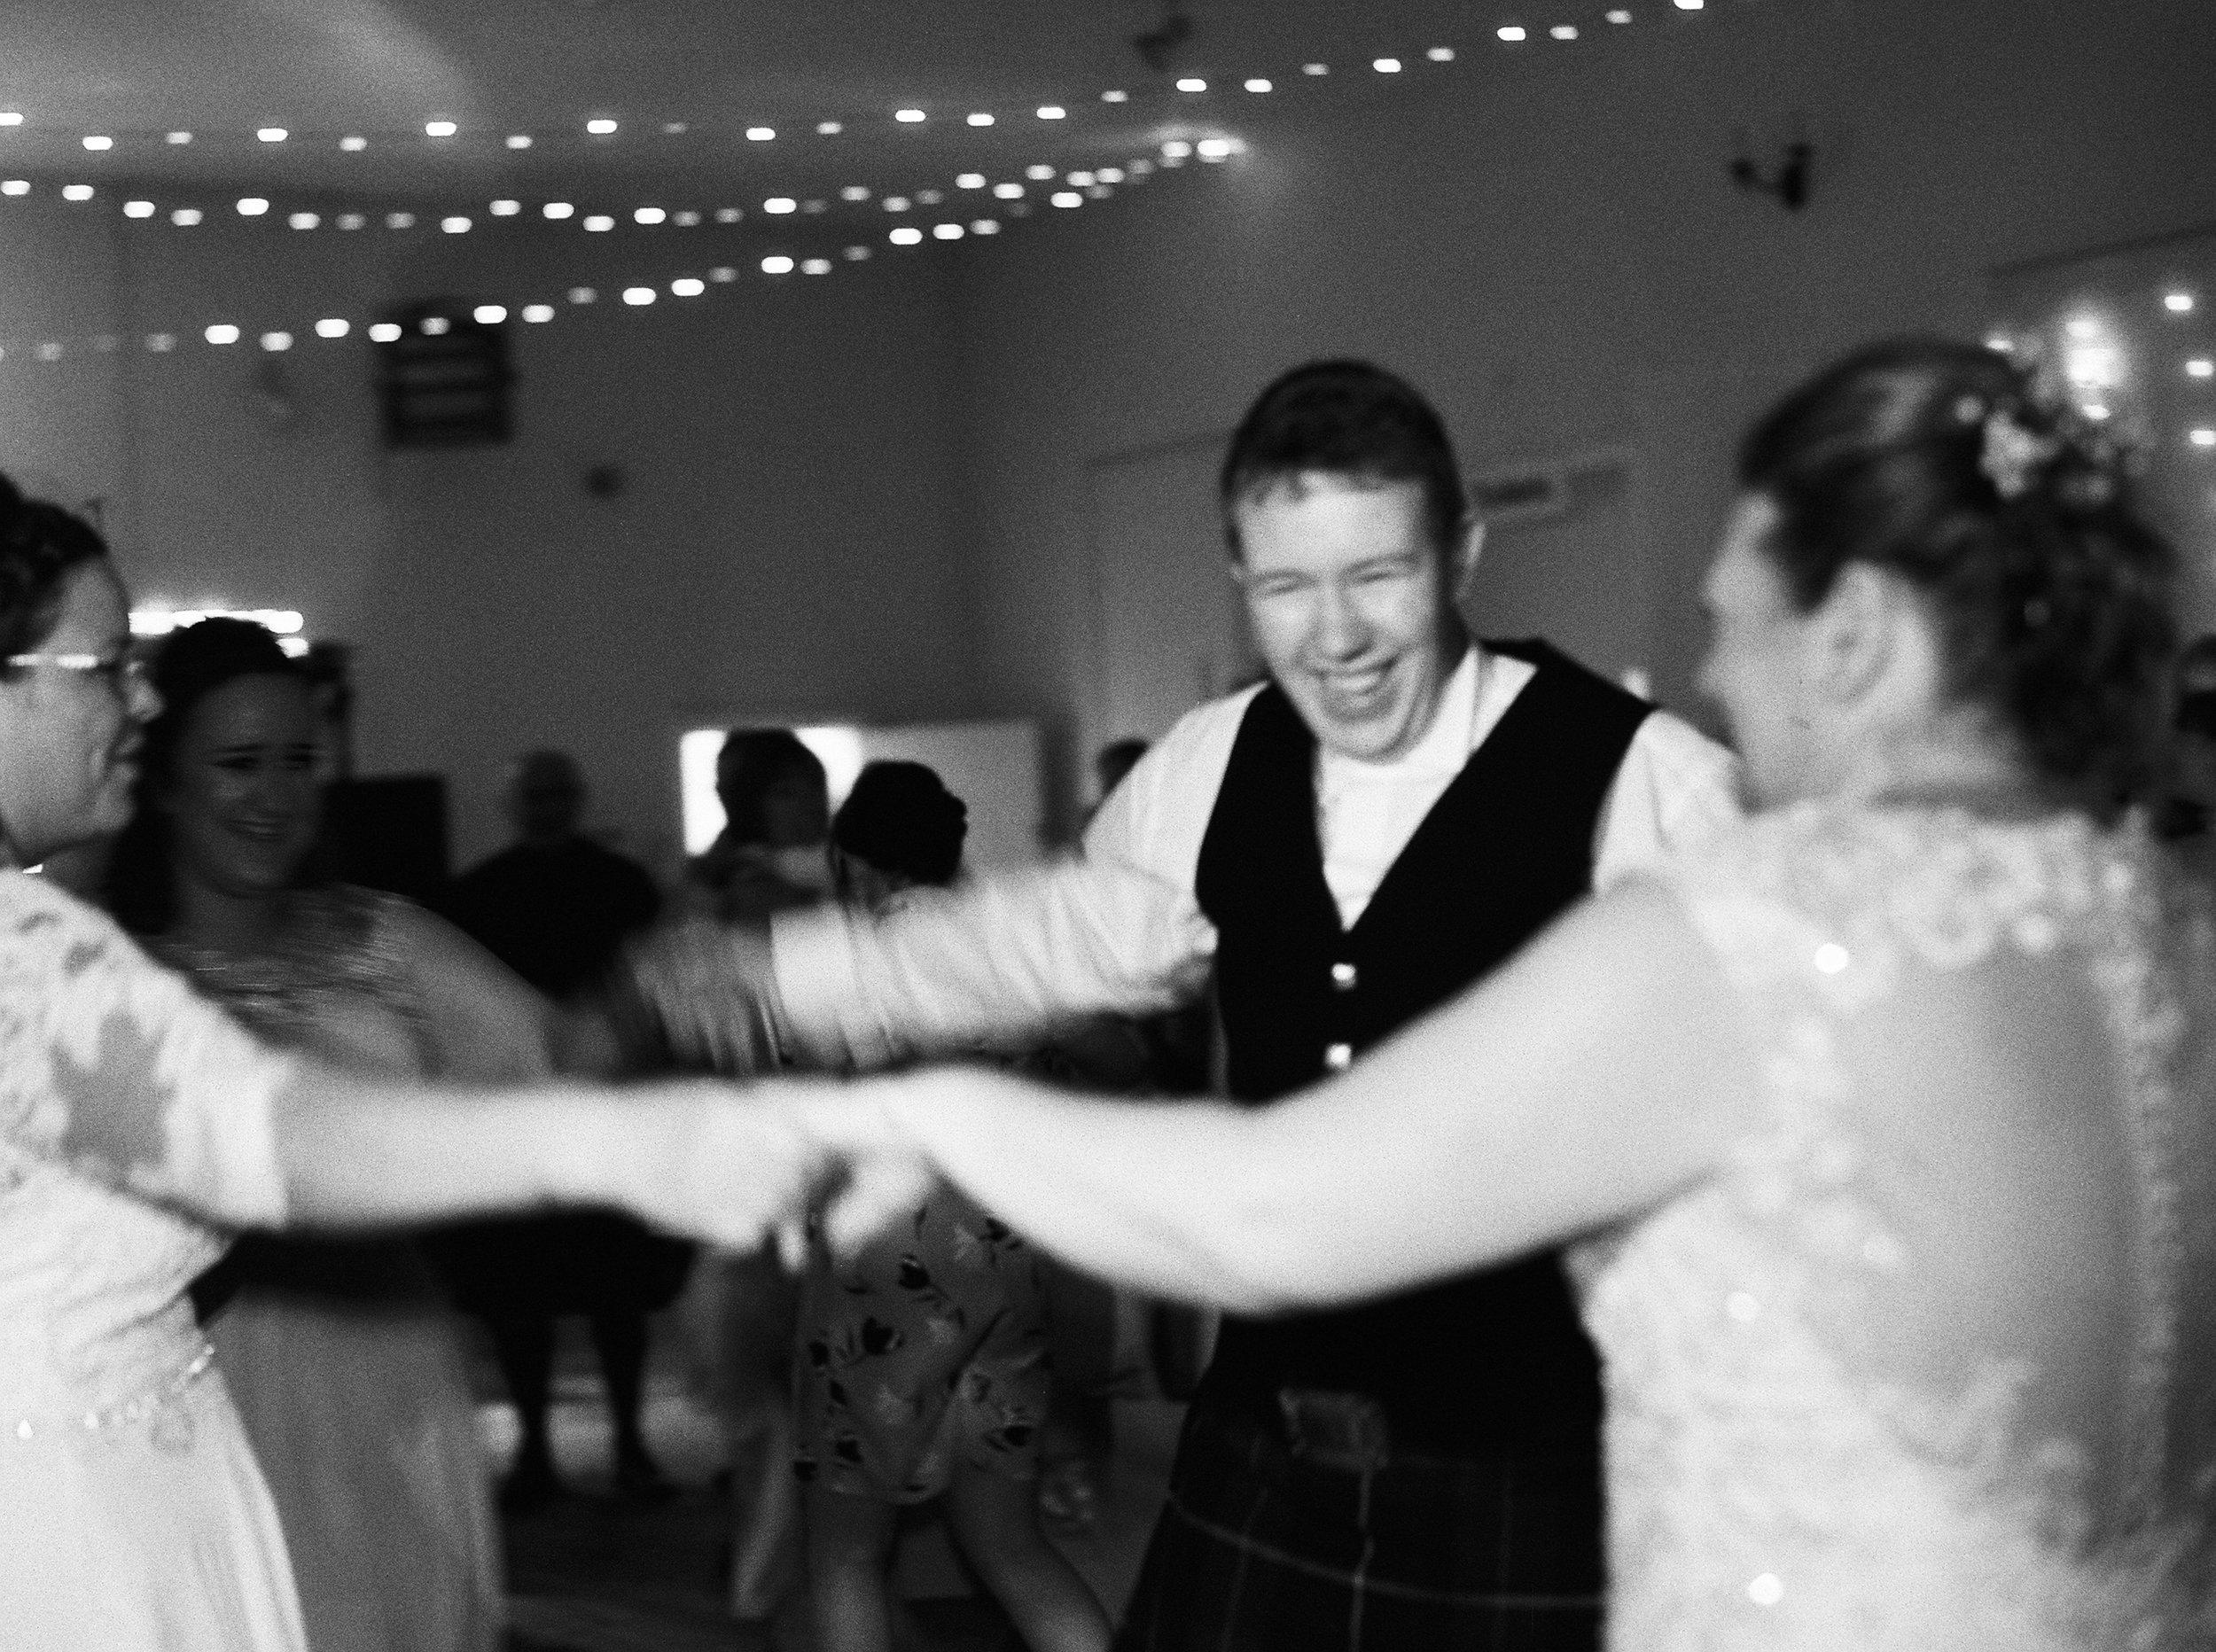 wedding-photography-scotland133.jpg